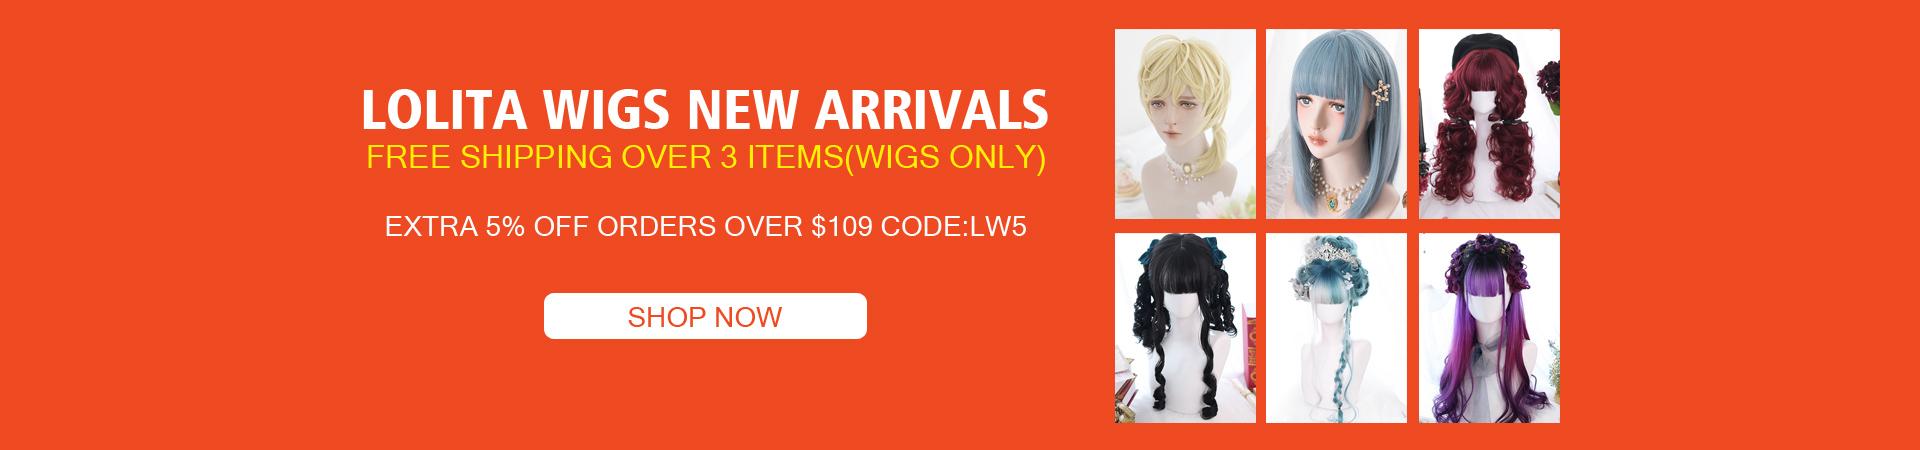 Lolita Wigs New Arrivals